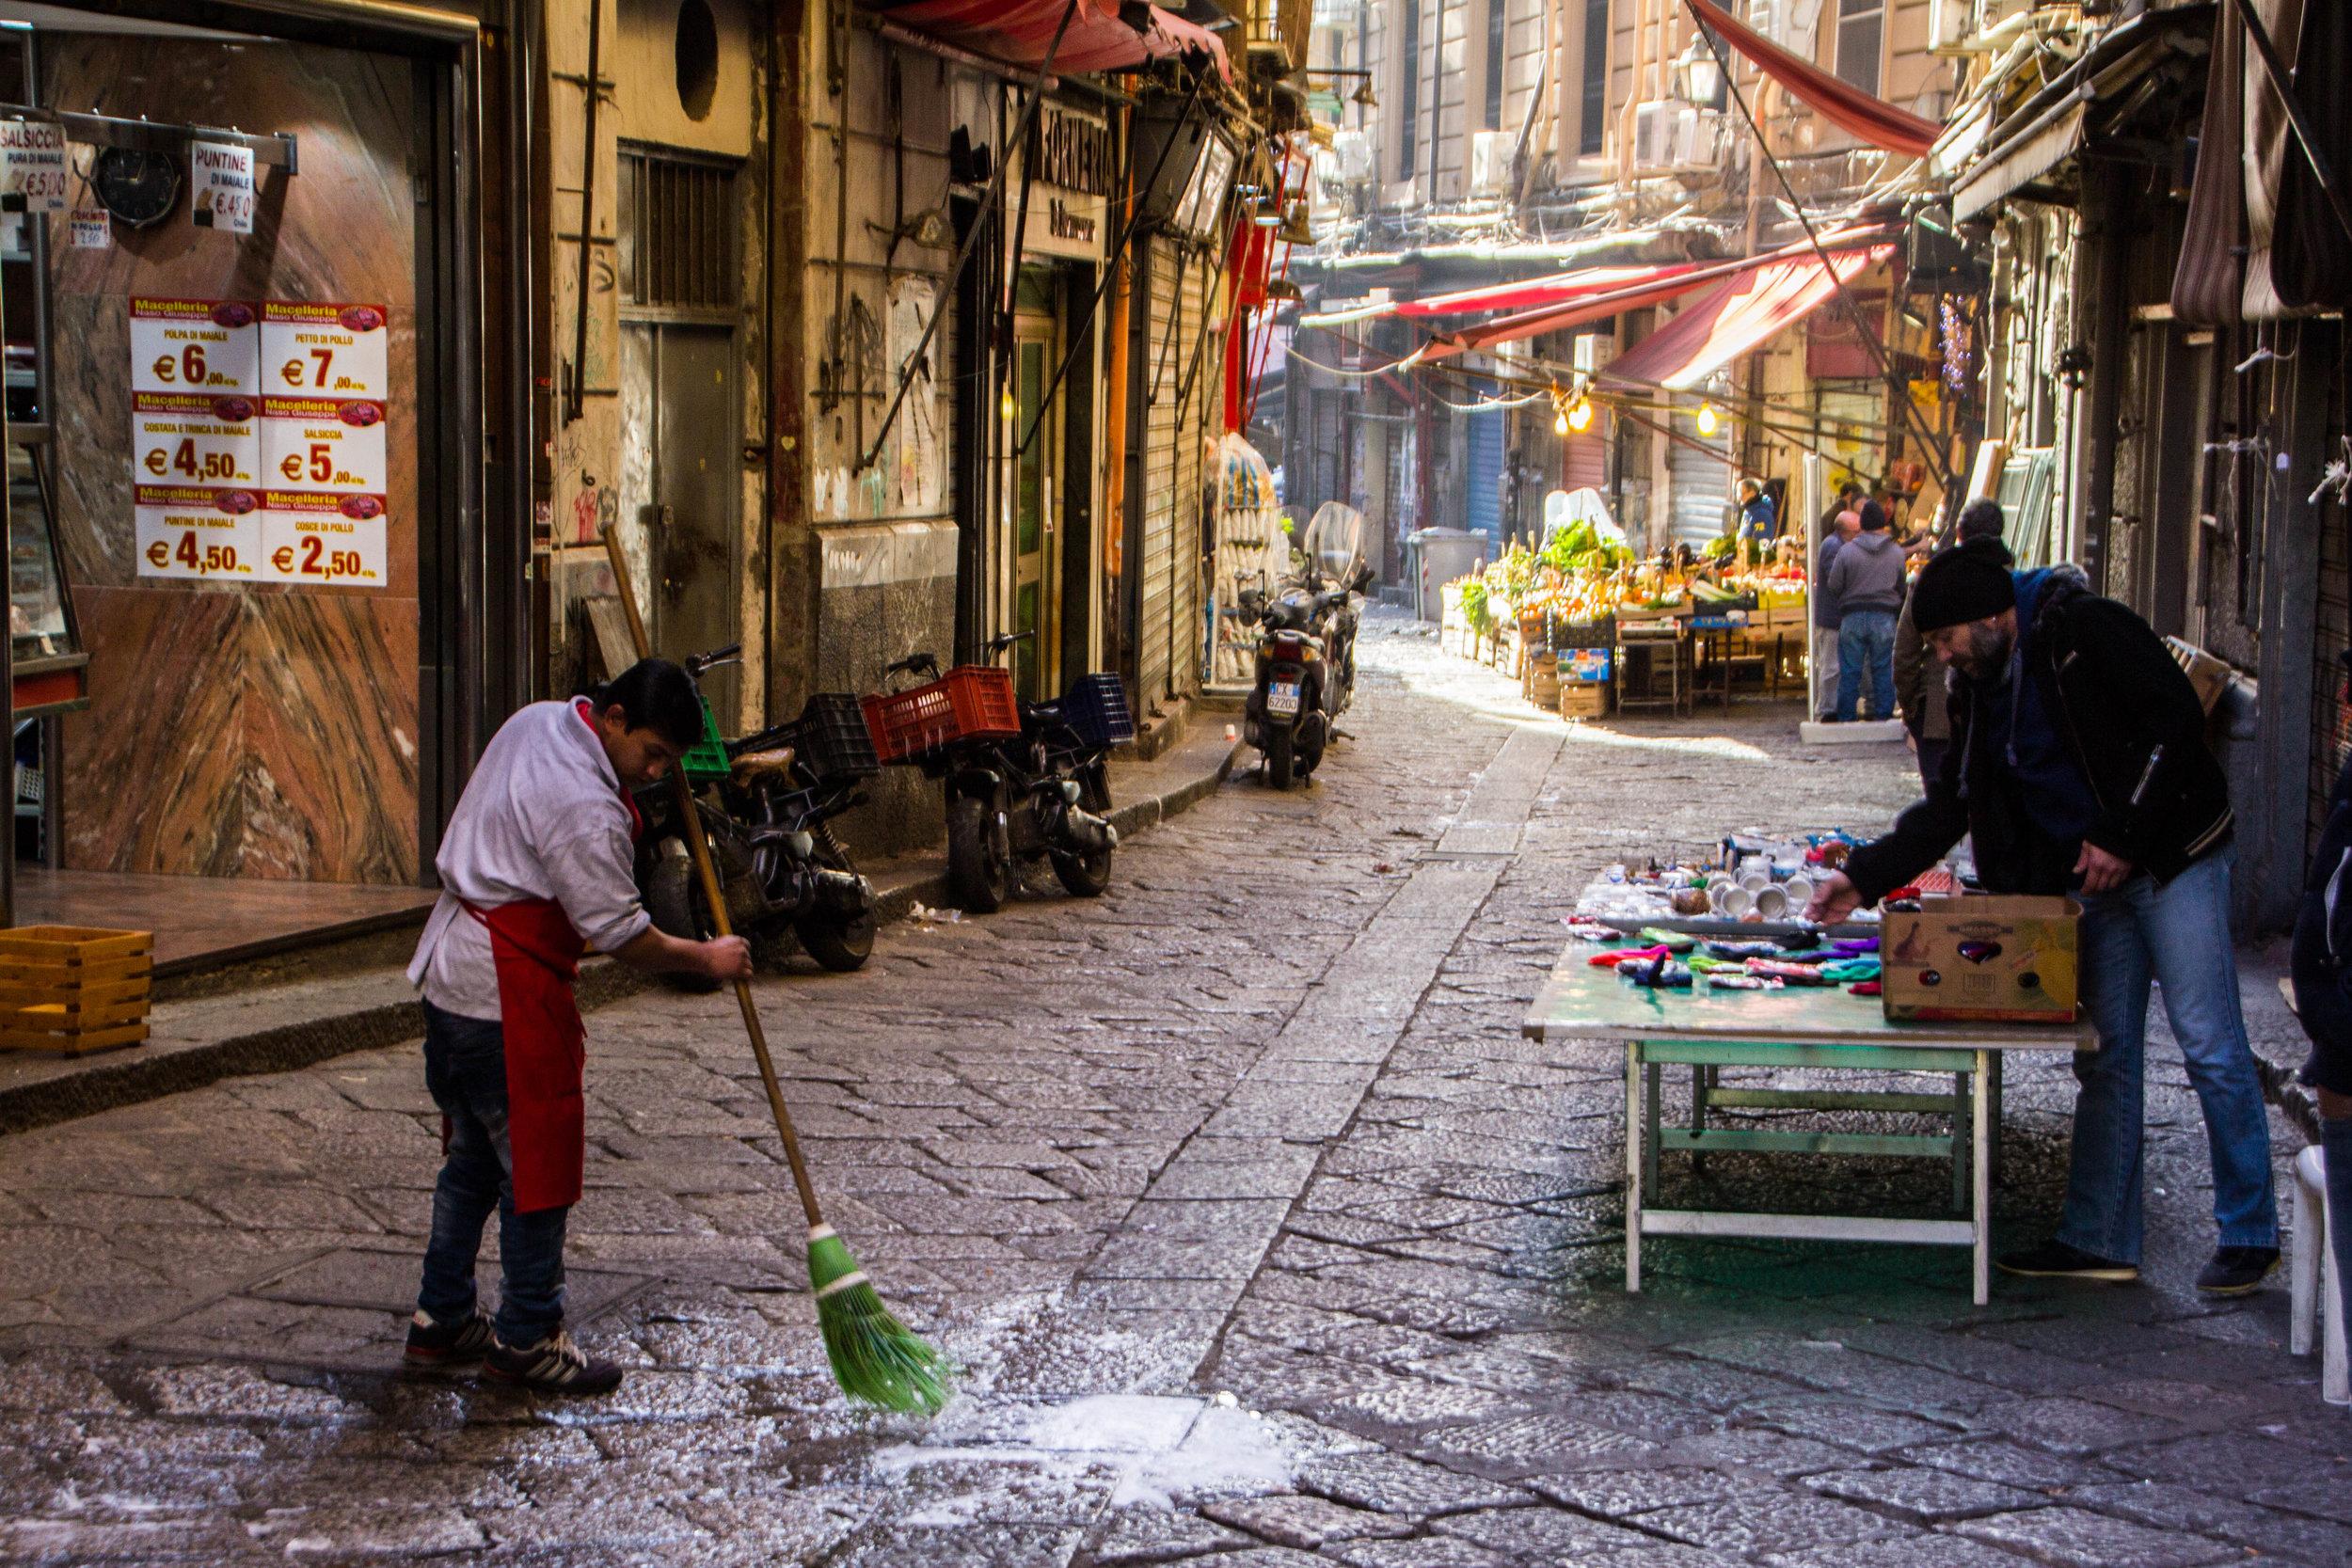 street-photography-palermo-sicily-17.jpg